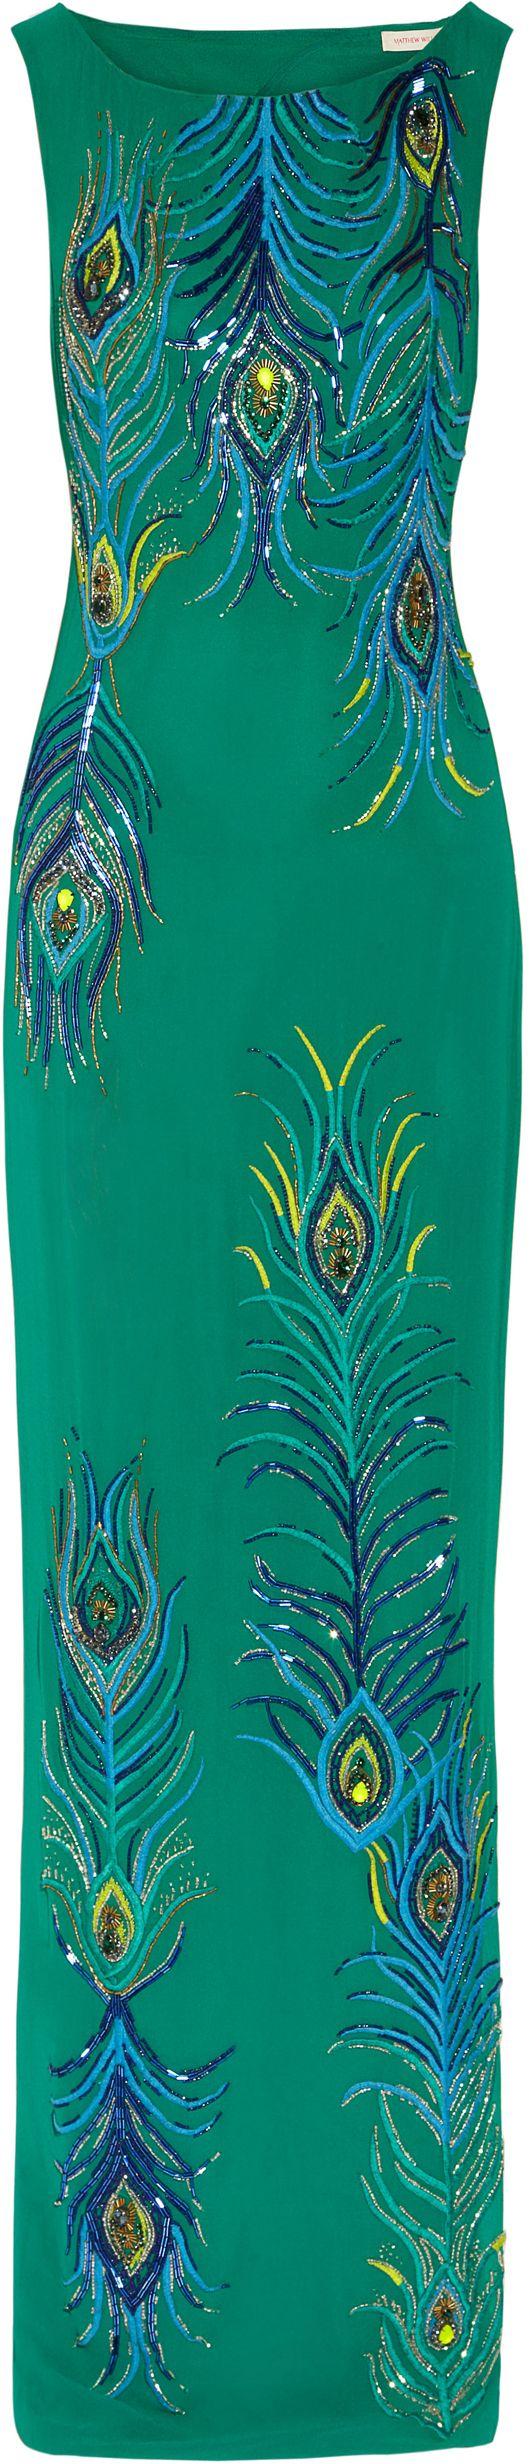 beaded peacock pattern | 342094 Matthew Williamson PEACOCK BEADED CUTOUT COLUMN DRESS NET A ...